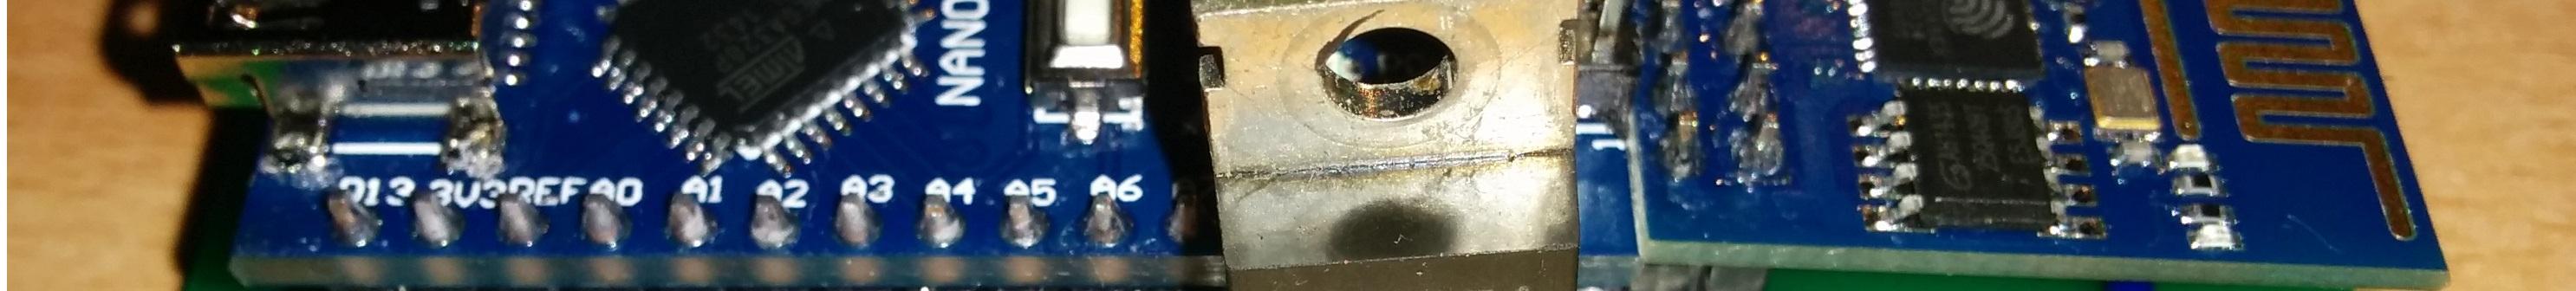 Elektronik Dachbude